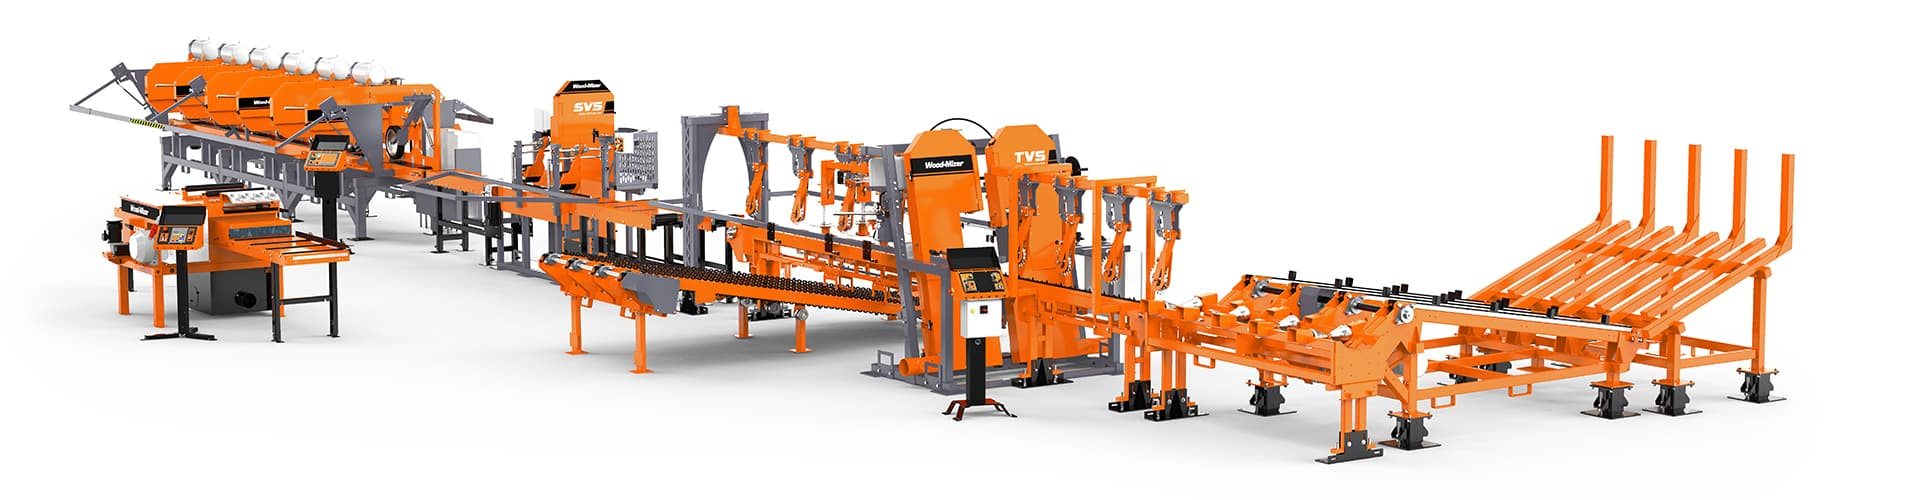 SLP1 Small Log Processing Line